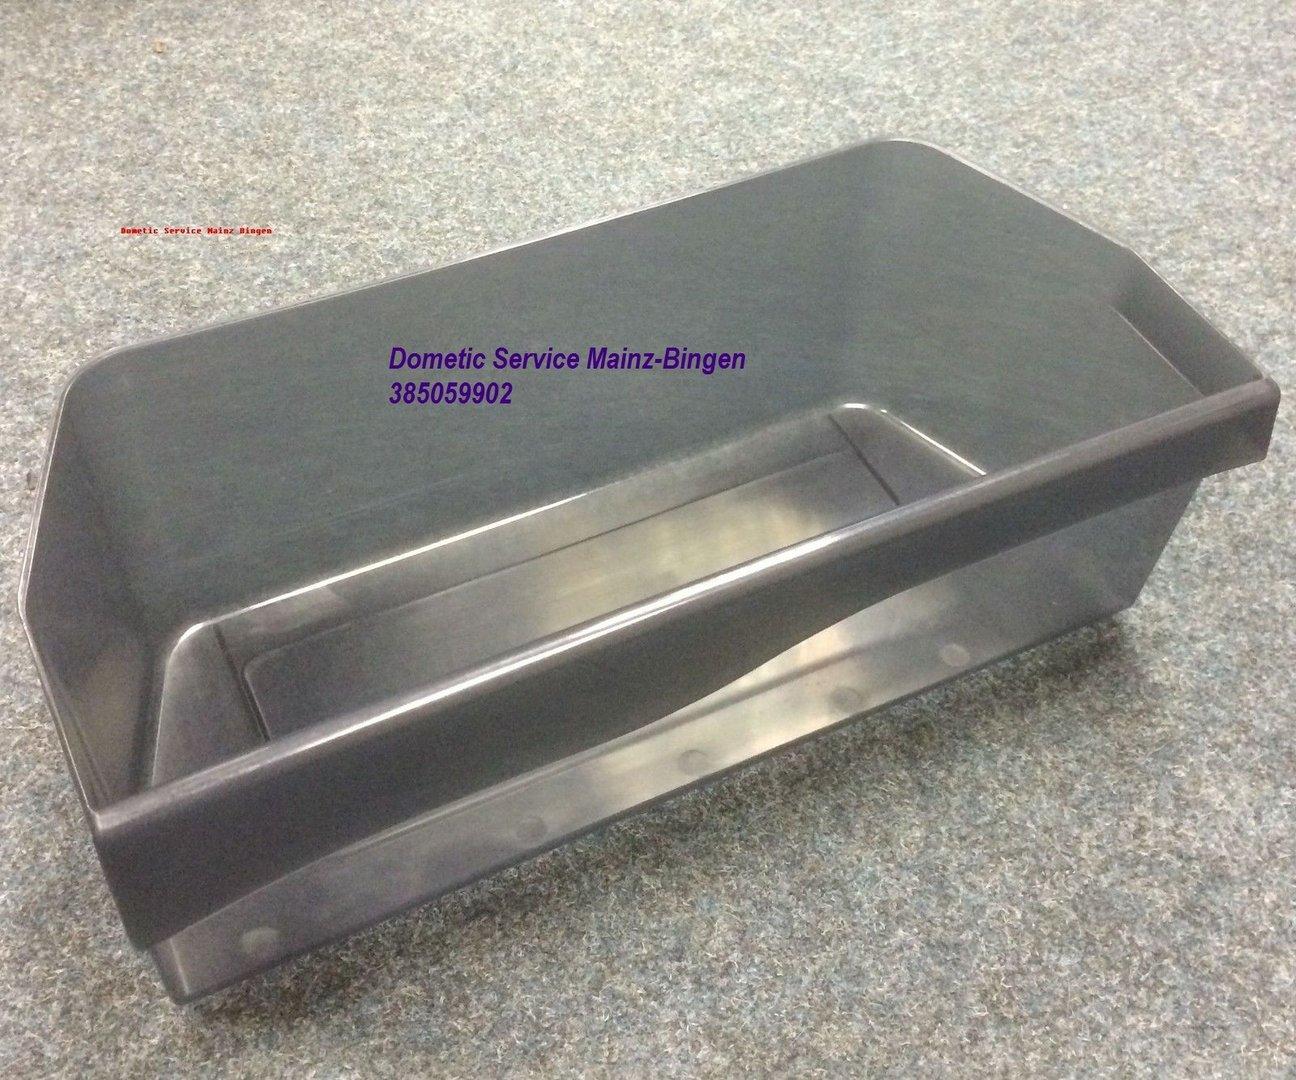 Kühlschrank Electrolux : Gemüseschale zu dometic electrolux kühlschrank z b rm usw